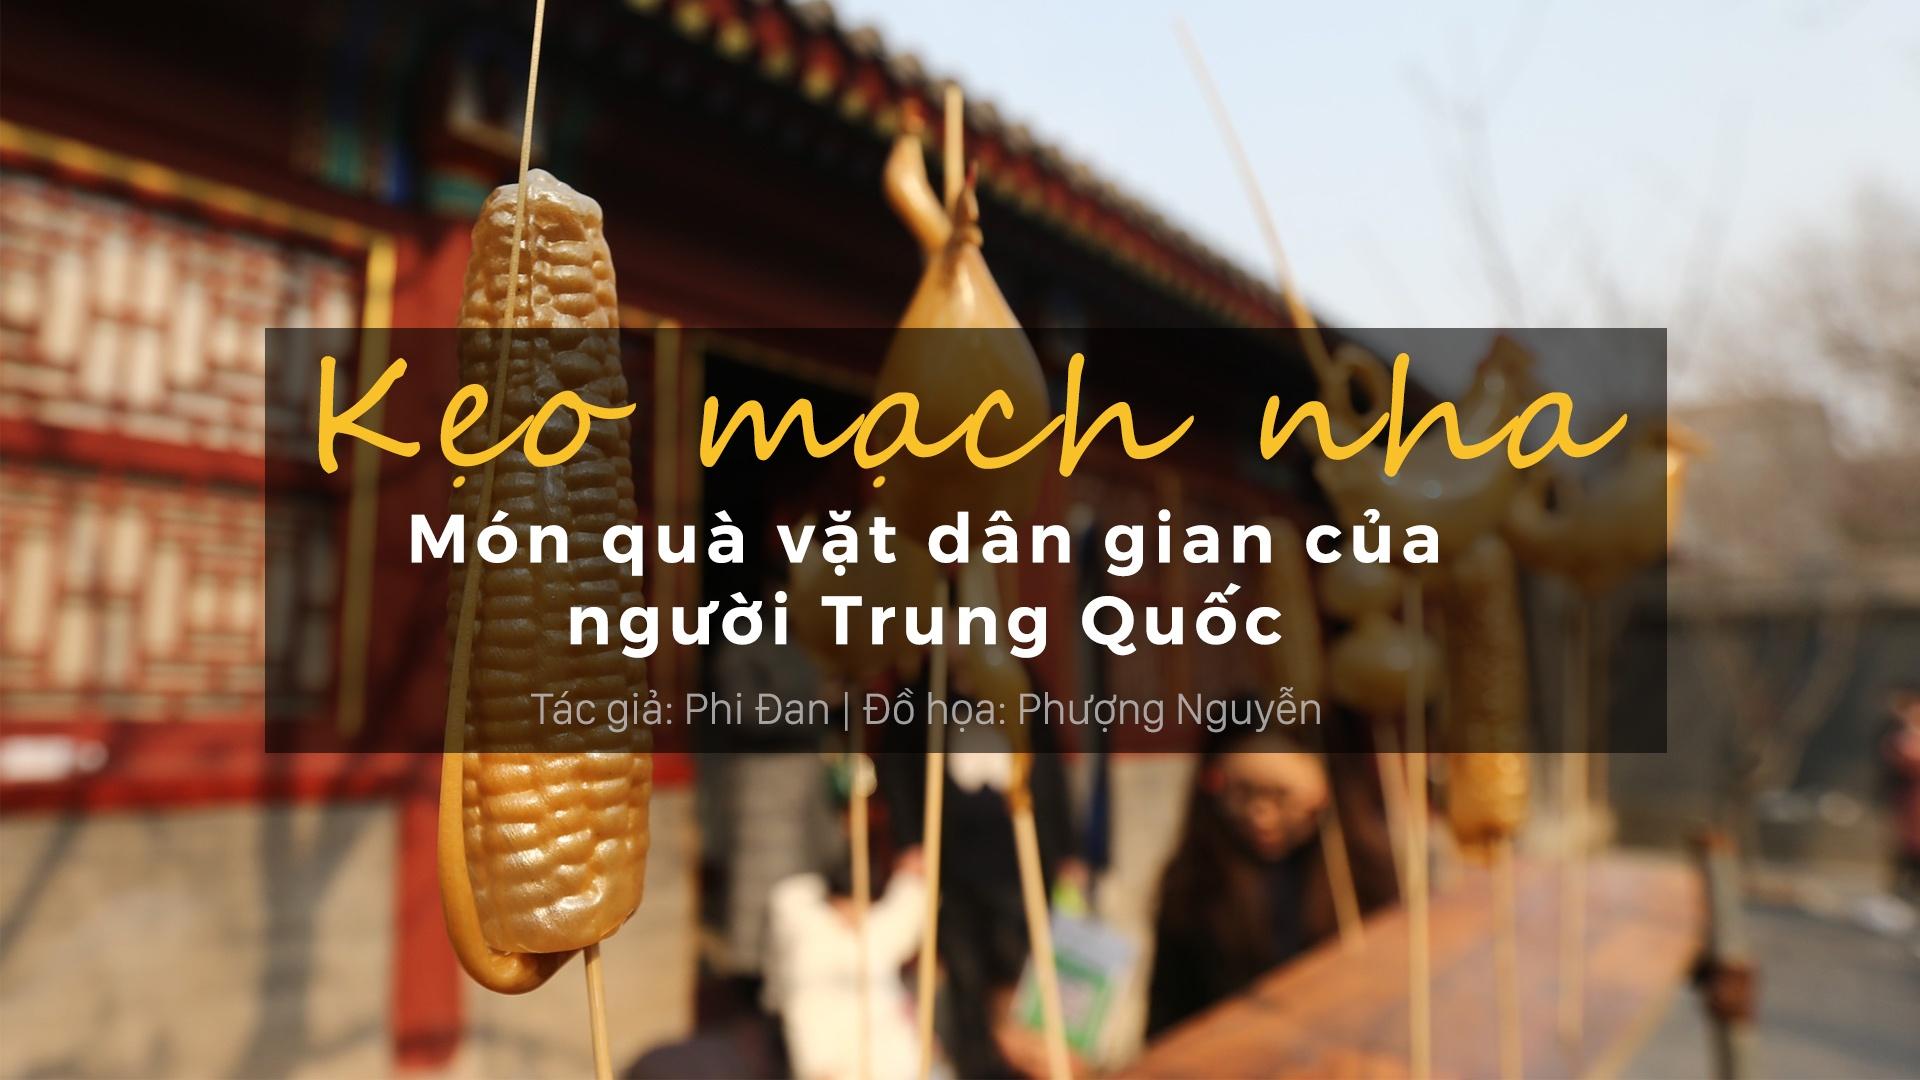 Keo mach nha - mon qua vat dan gian cua nguoi Trung Quoc hinh anh 1